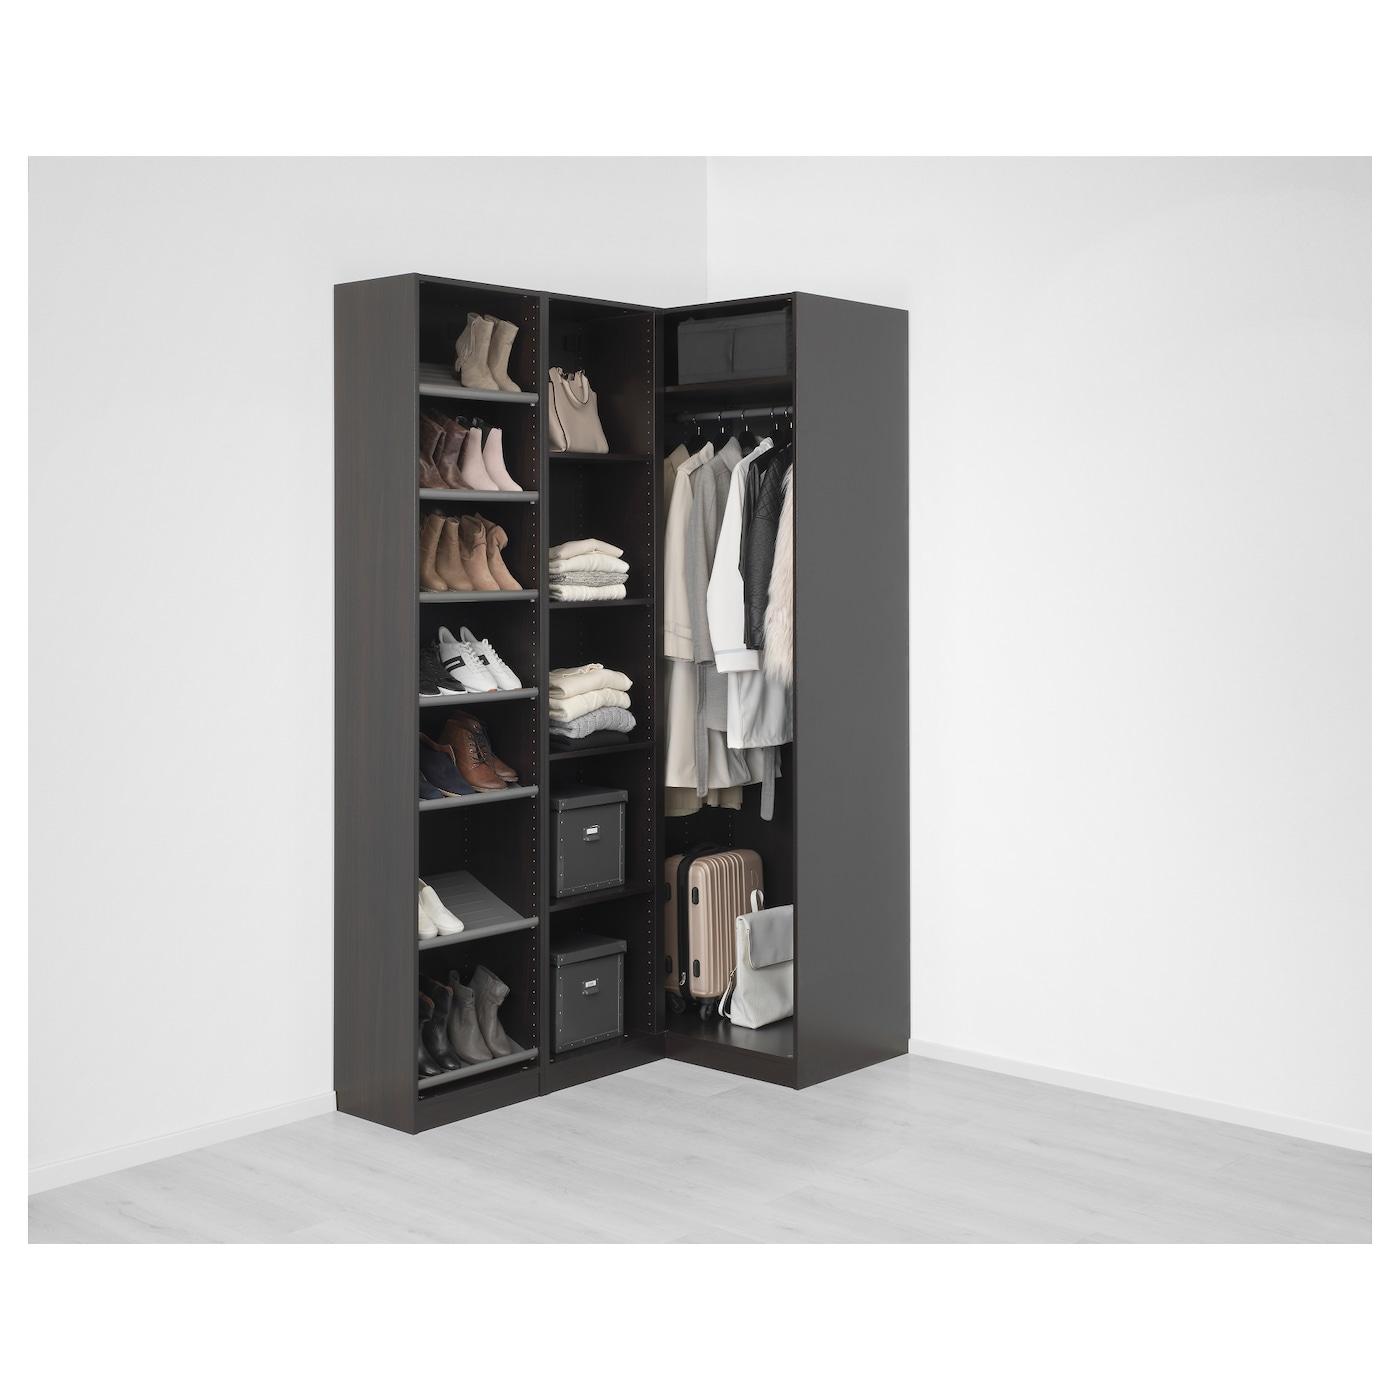 Pax corner wardrobe black brown nexus vikedal 160 88x236 - Armarios roperos de ikea ...